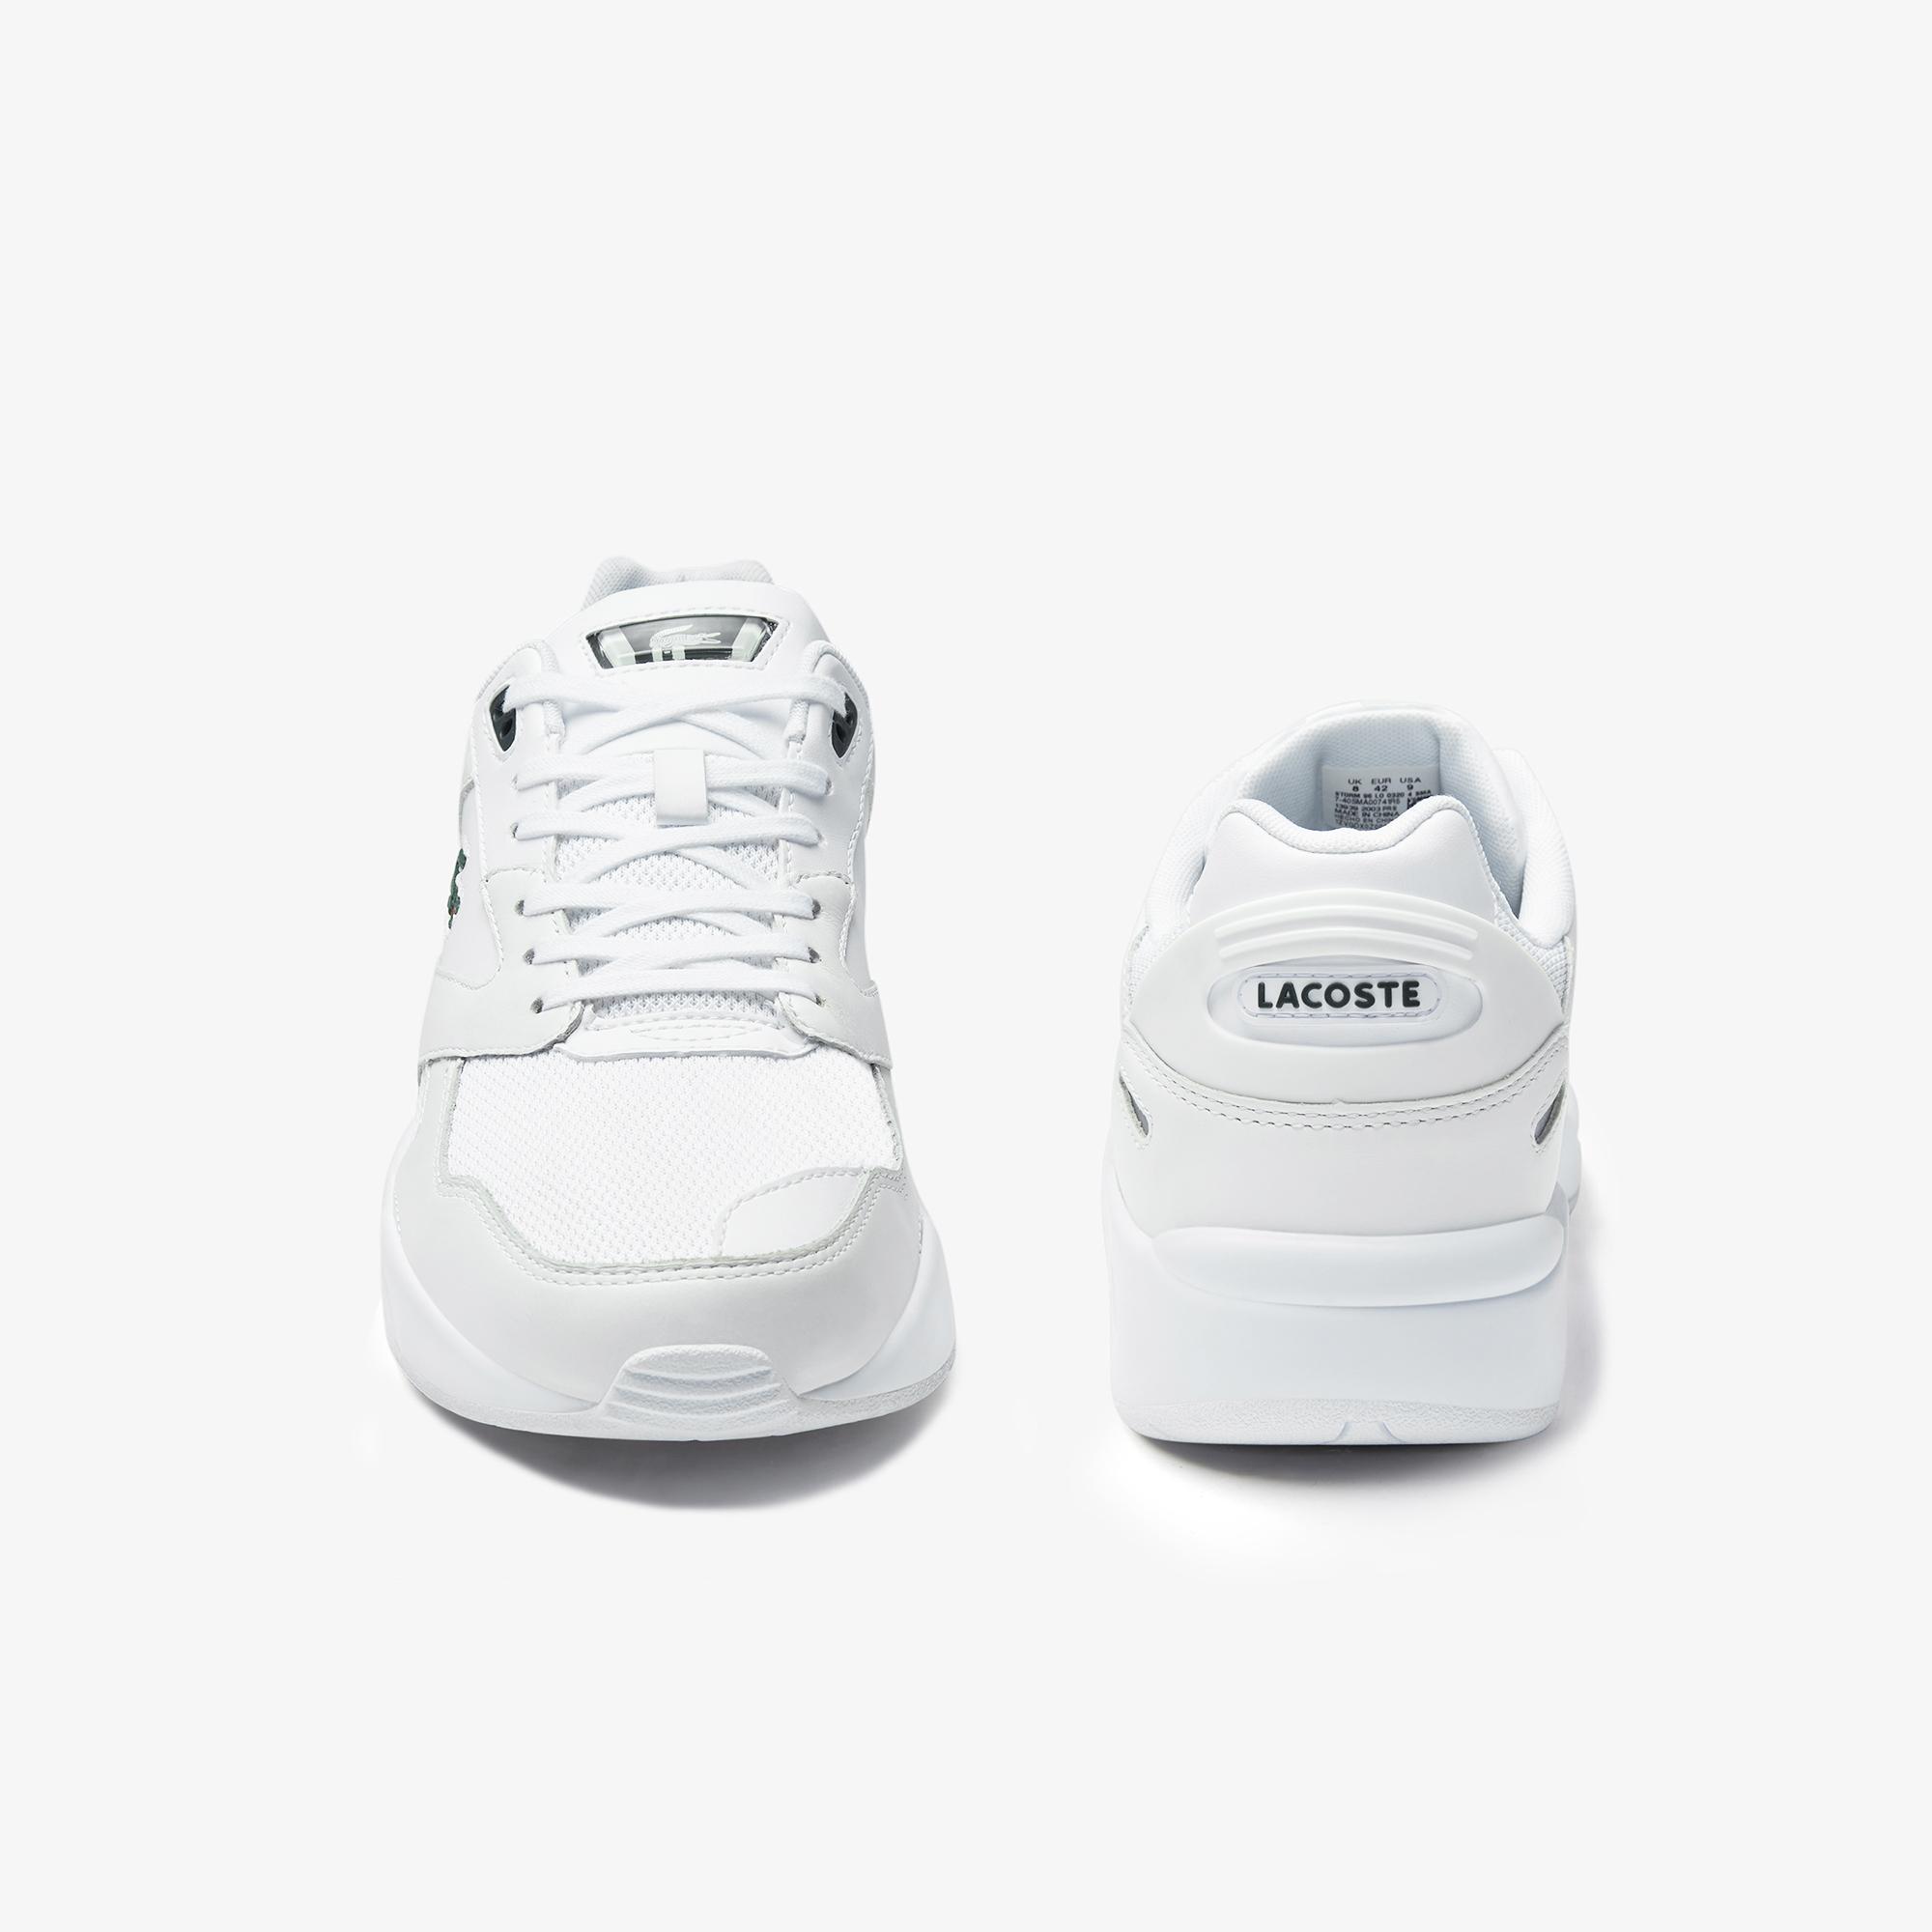 Lacoste Storm 96 Lo 0120 3 Sma Męskie Sneakersy